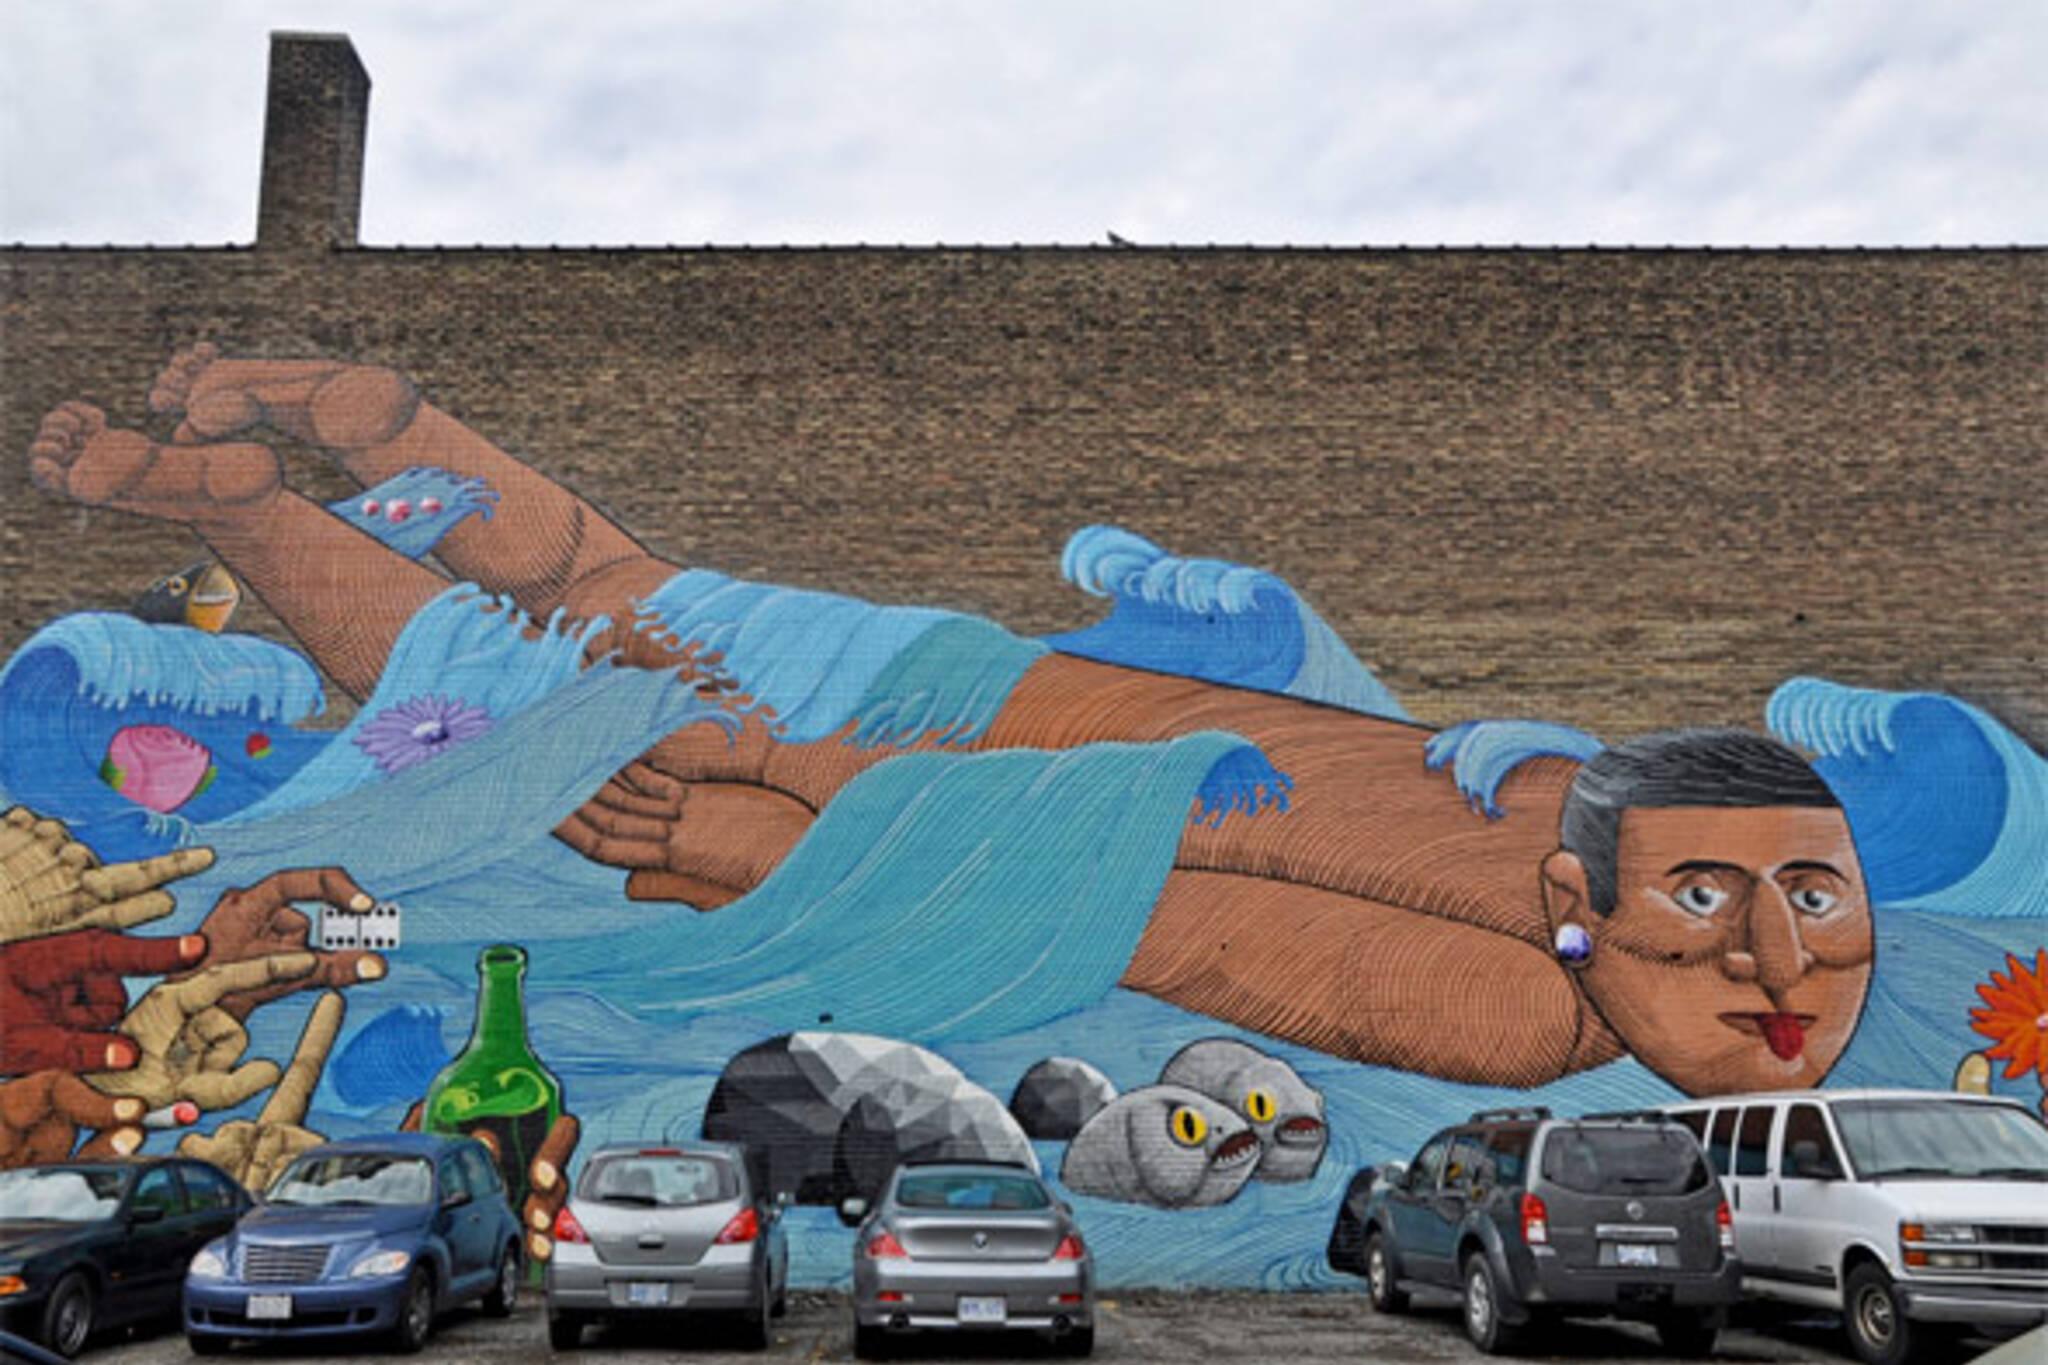 mural toronto